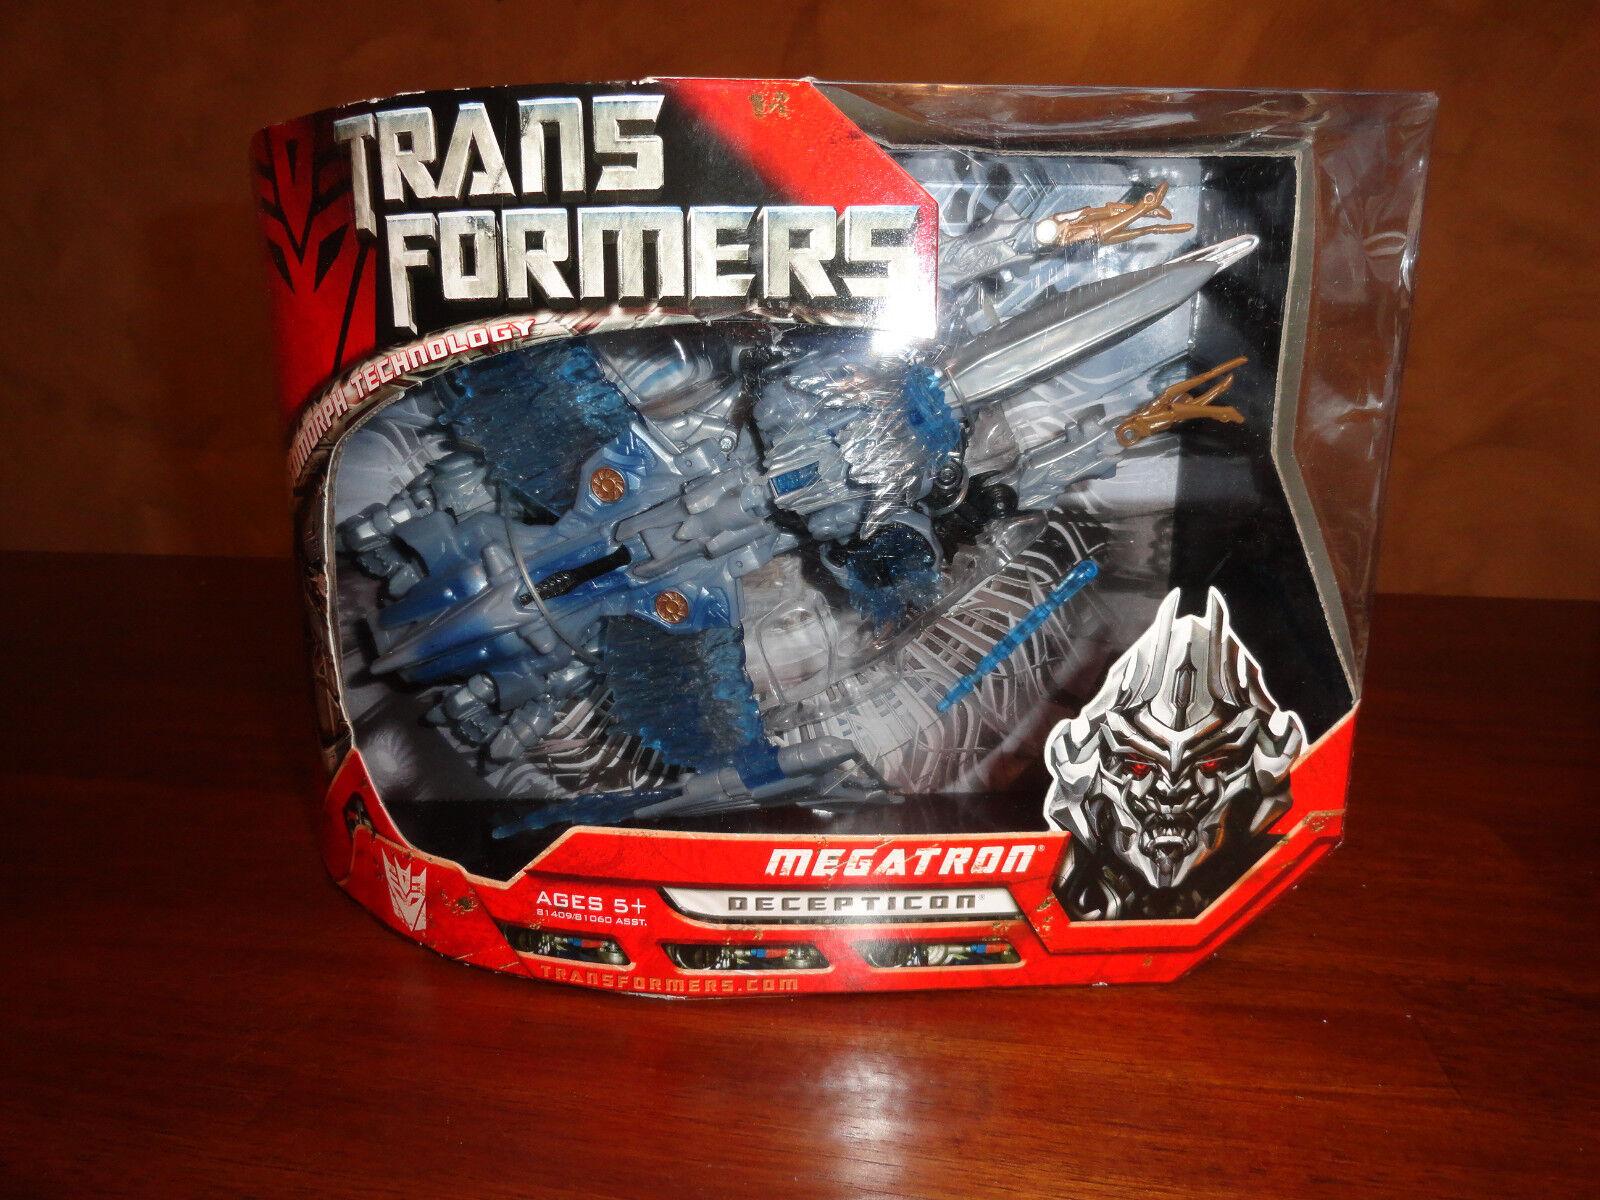 Brand New Hasbro Transformers Voyager Class Decepticon Megatron Cybertron